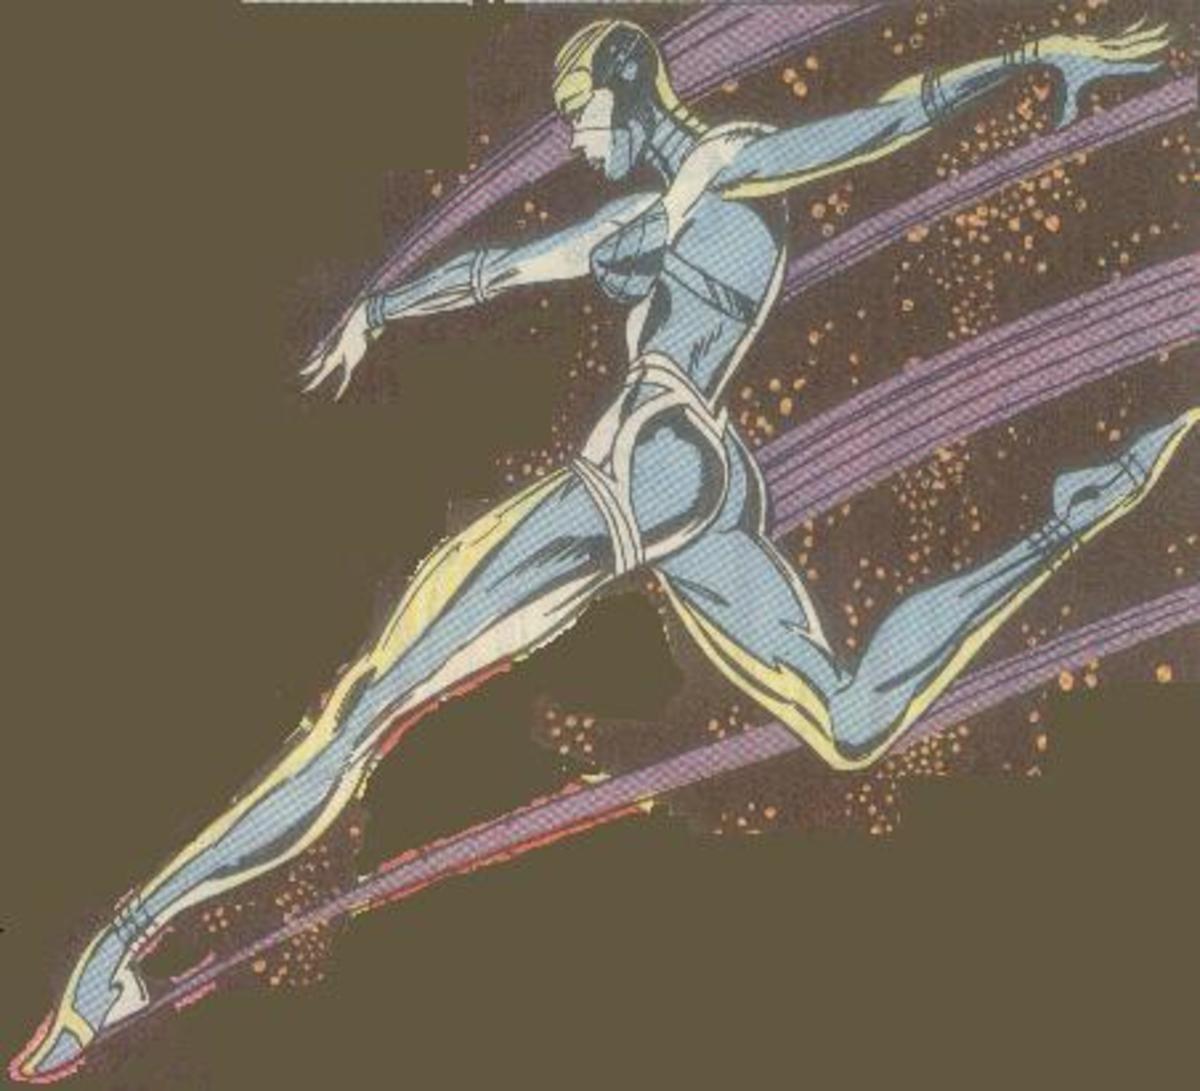 The Star Dancer